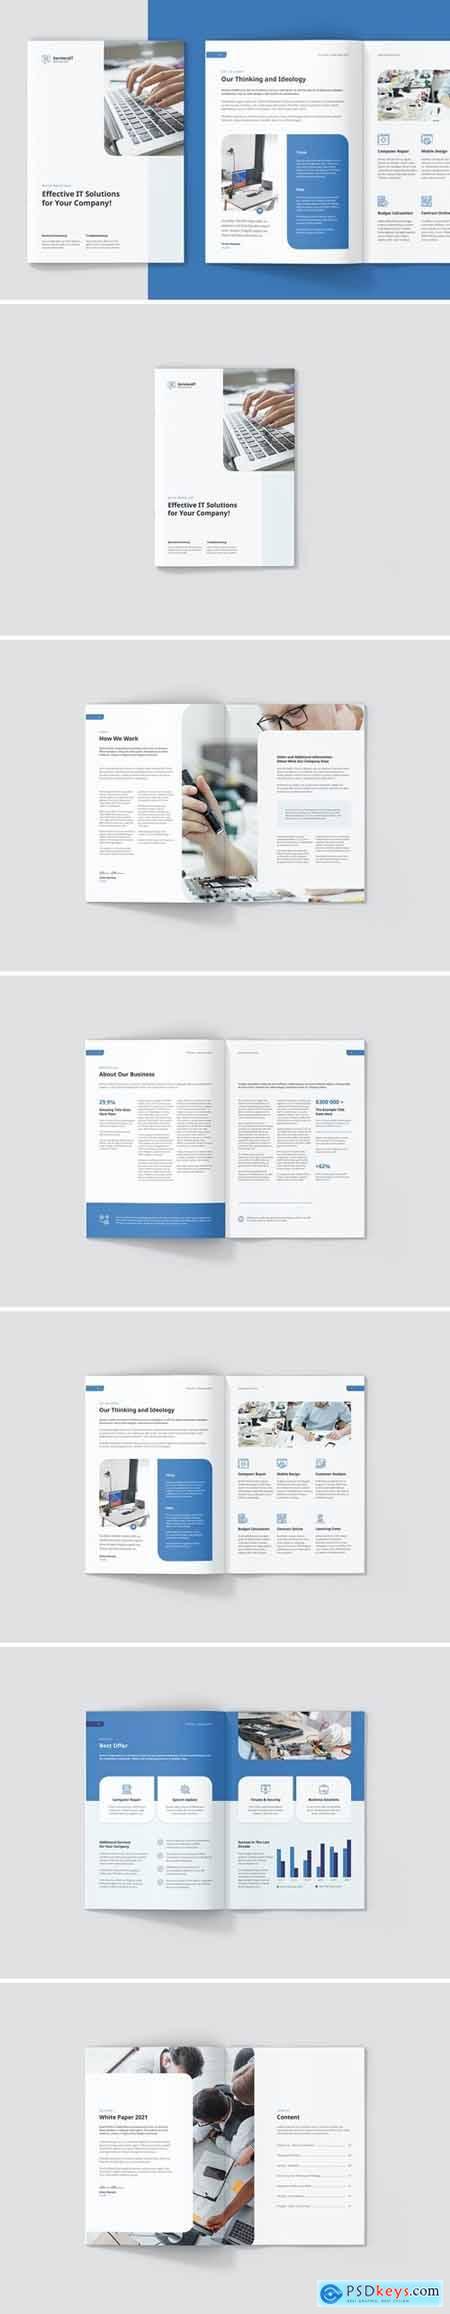 IT Services – White Paper 29724497